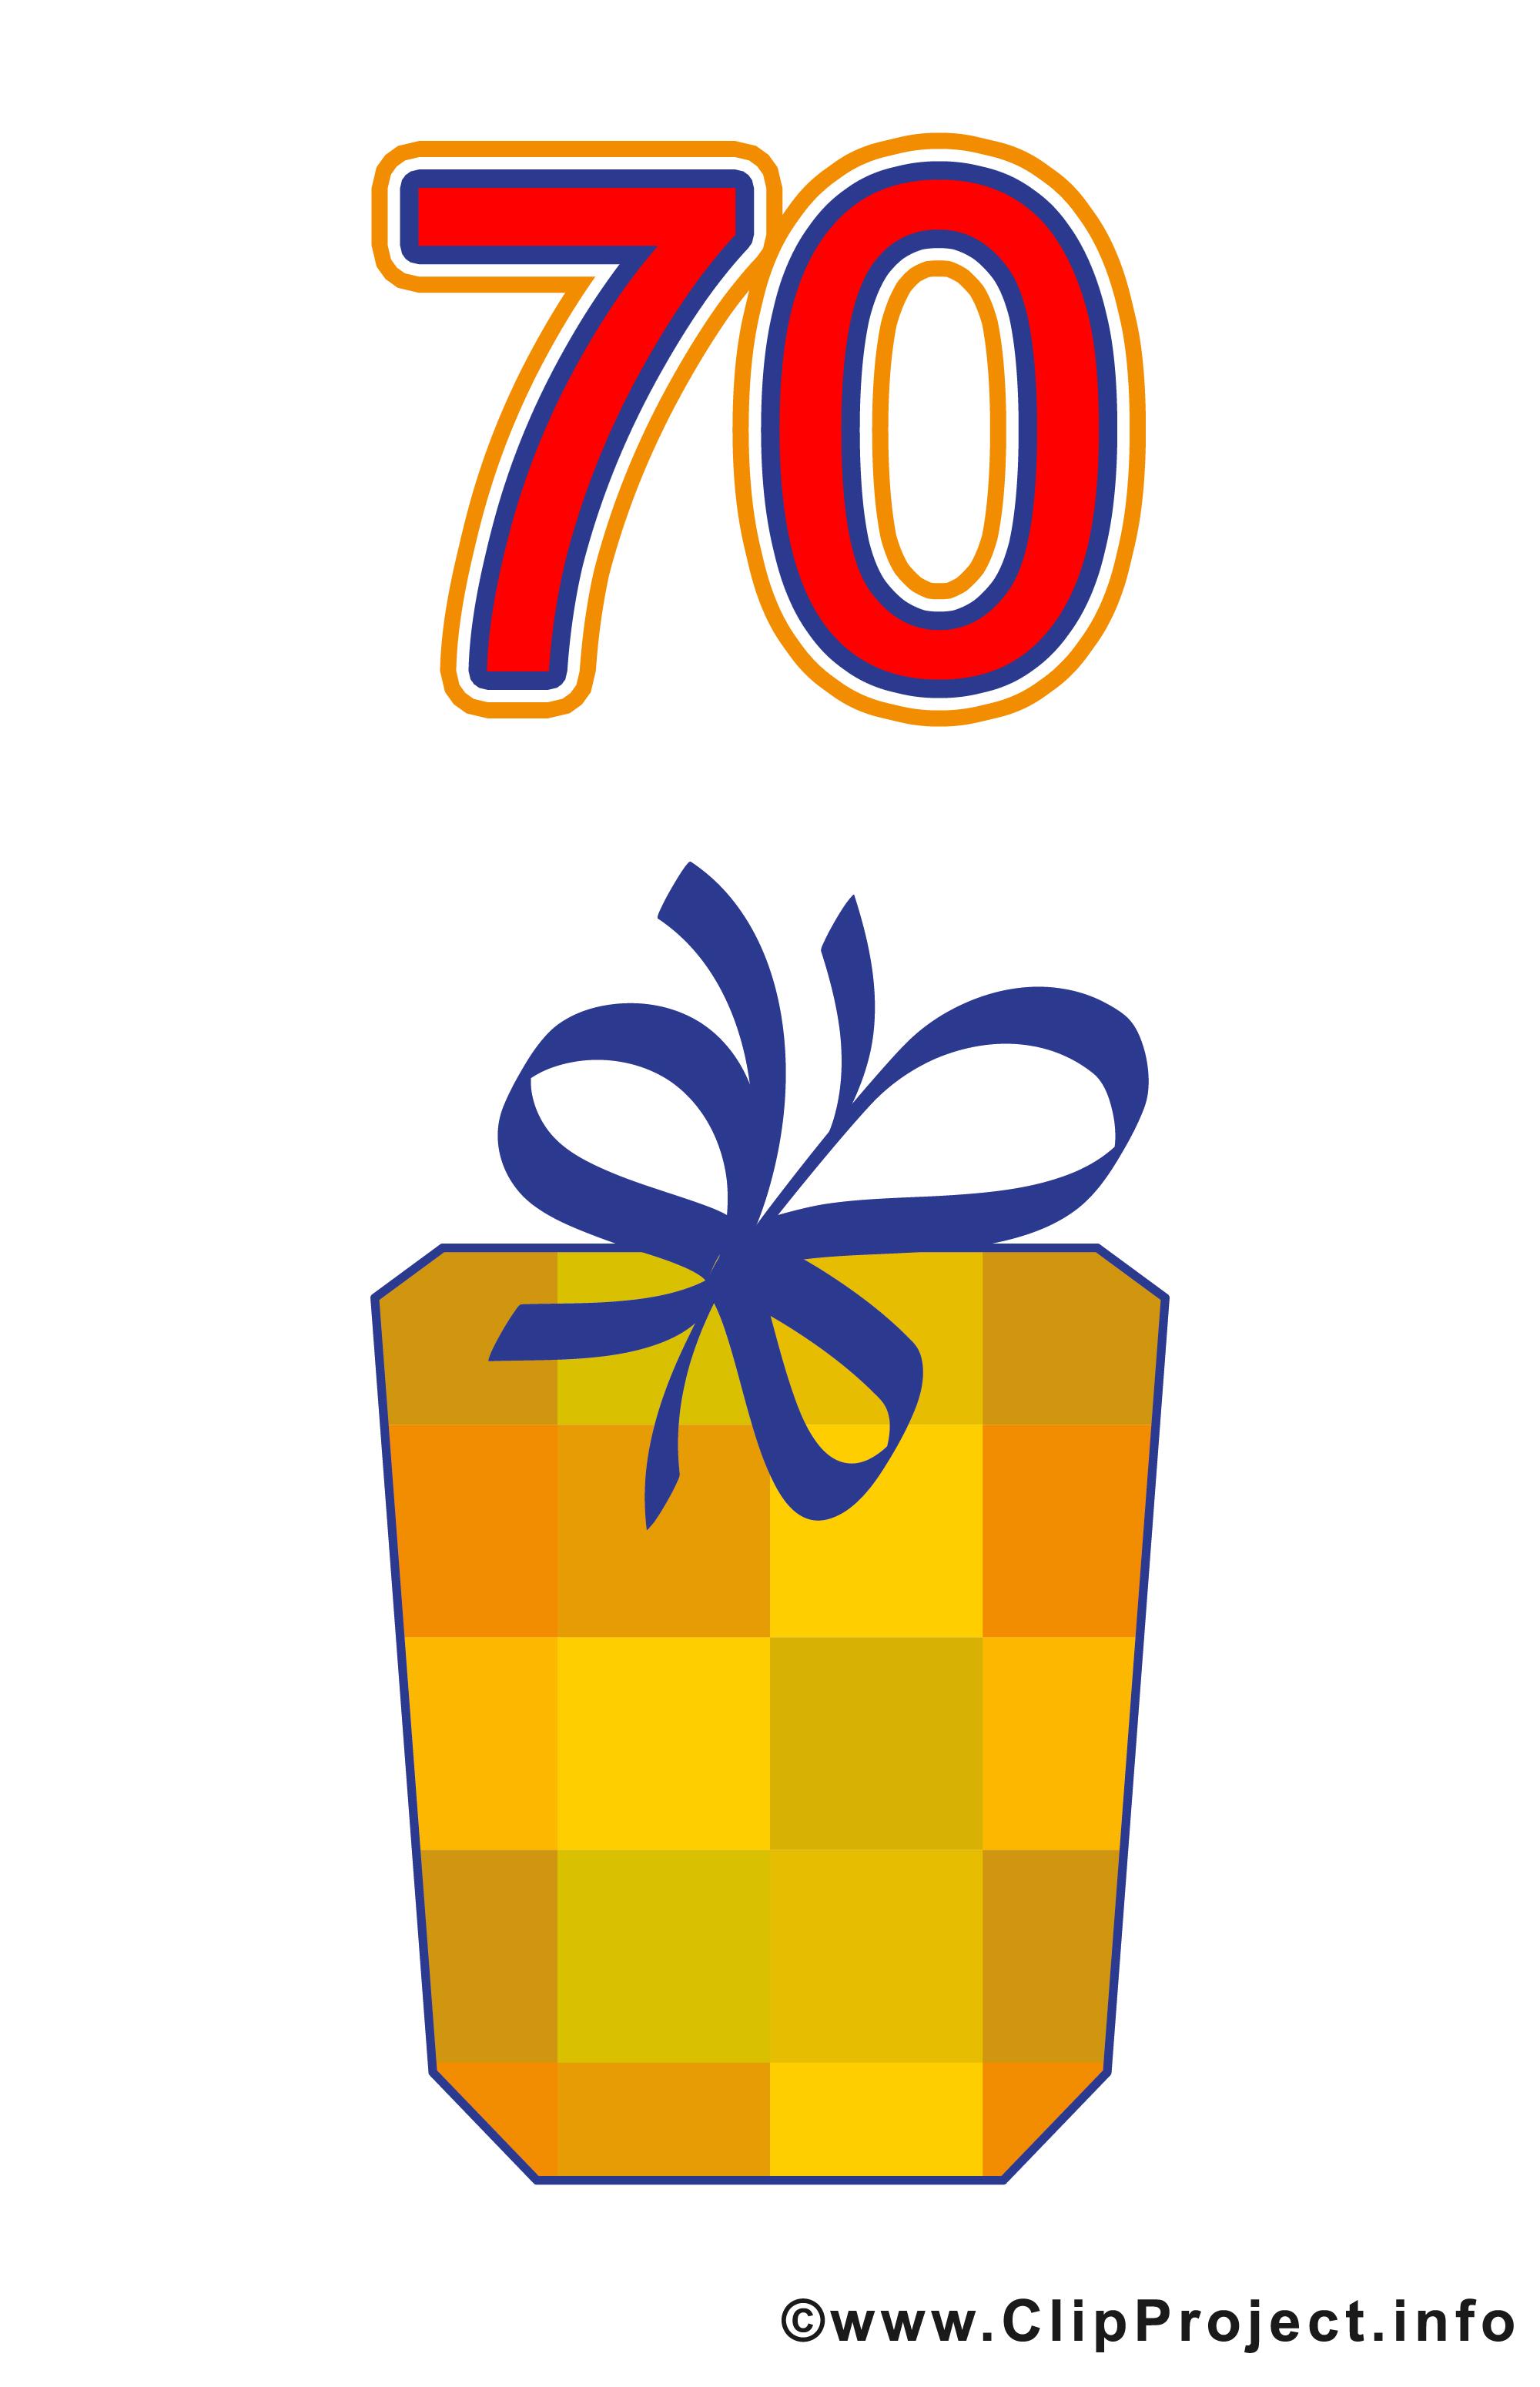 Clipart zahlen geburtstag image transparent stock Geschenk zum 70 Geburtstag Clipart gratis image transparent stock